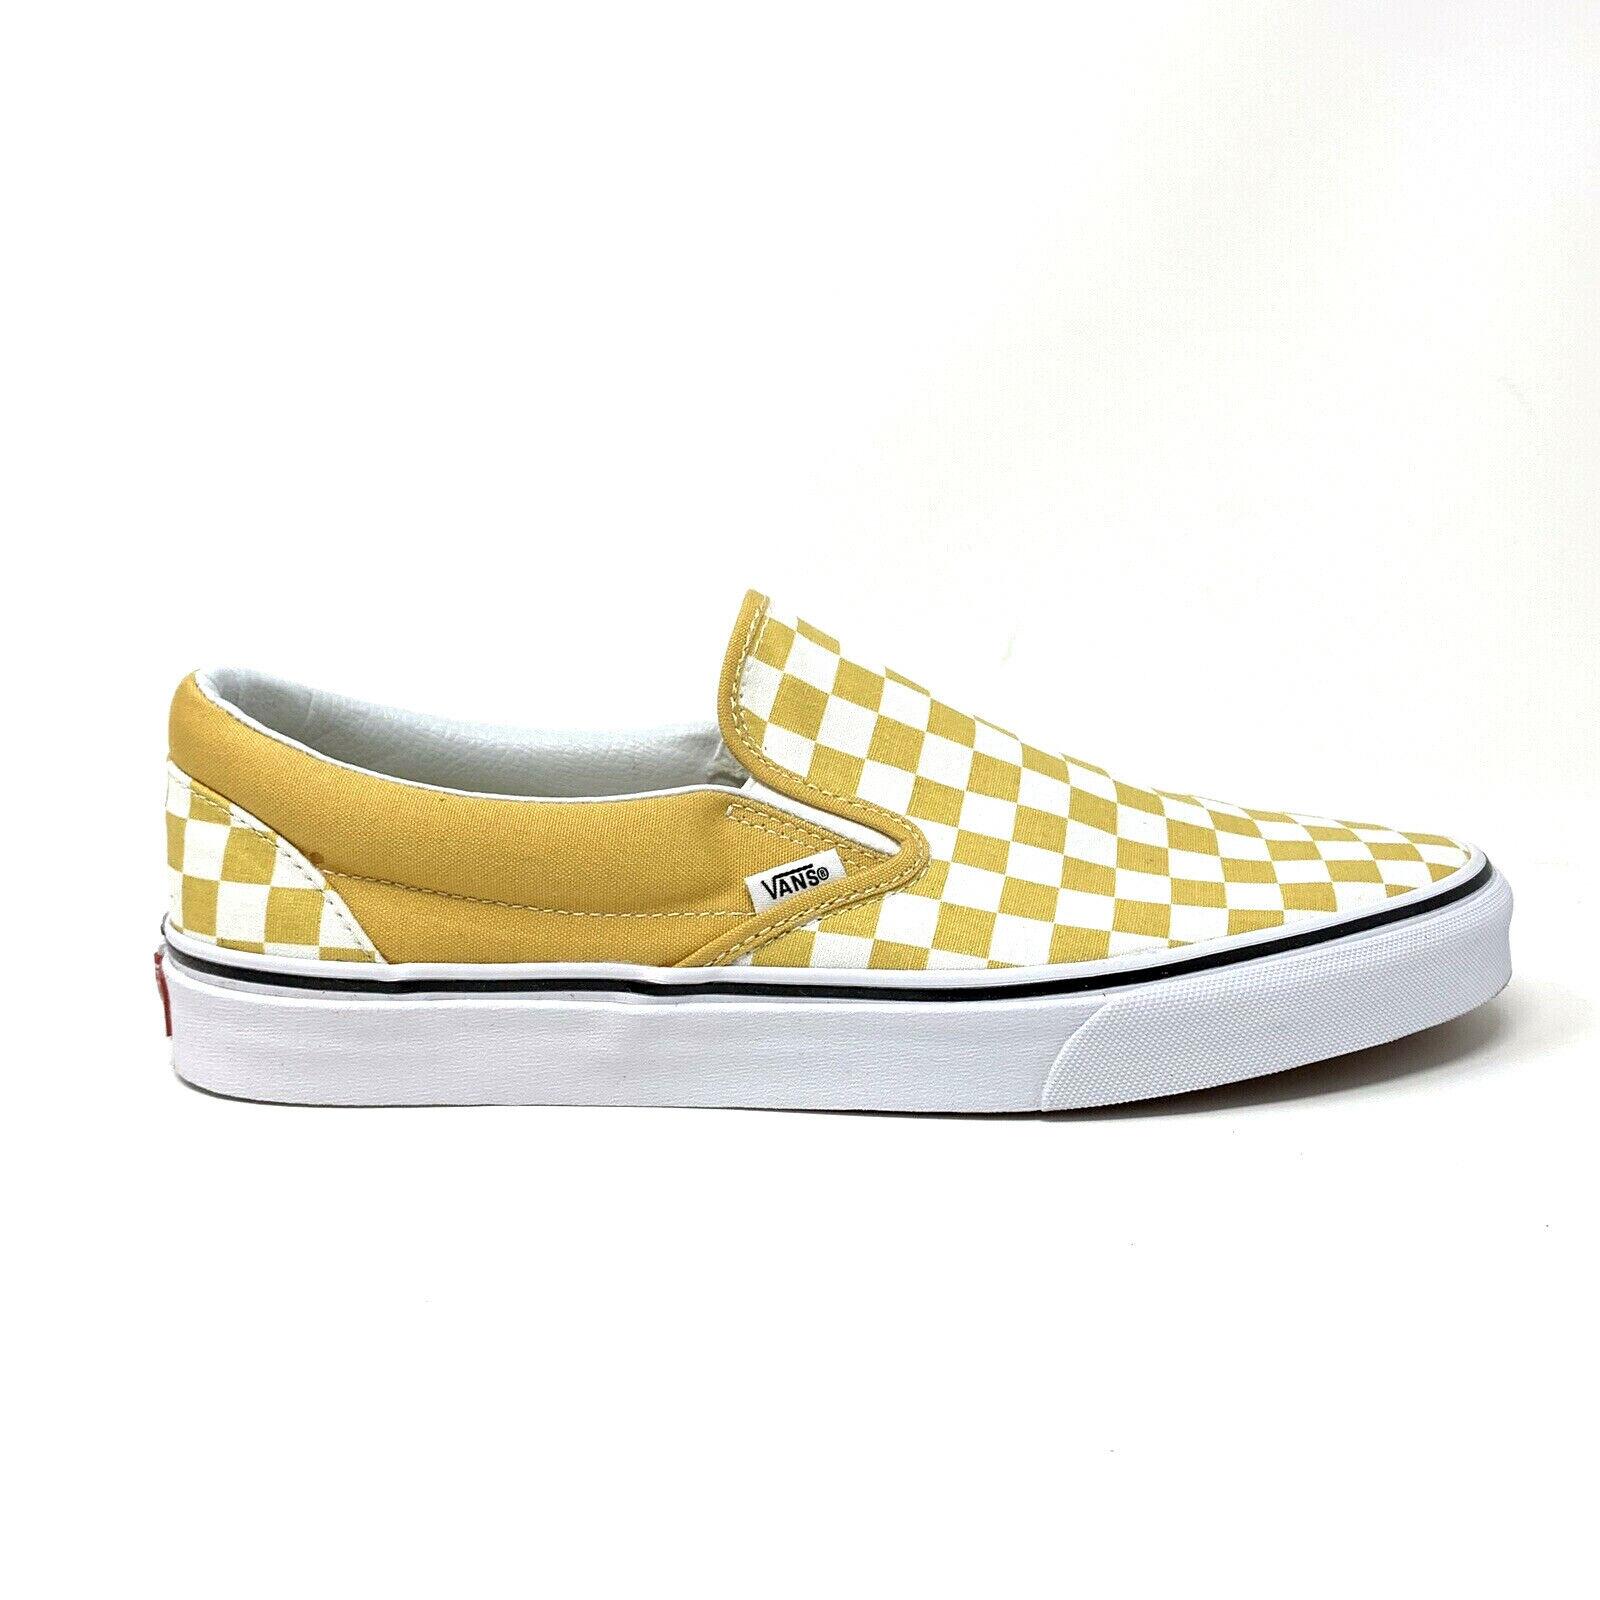 Vans Classic Slip On Yellow White Checkerboard Men's 11.5 Sk